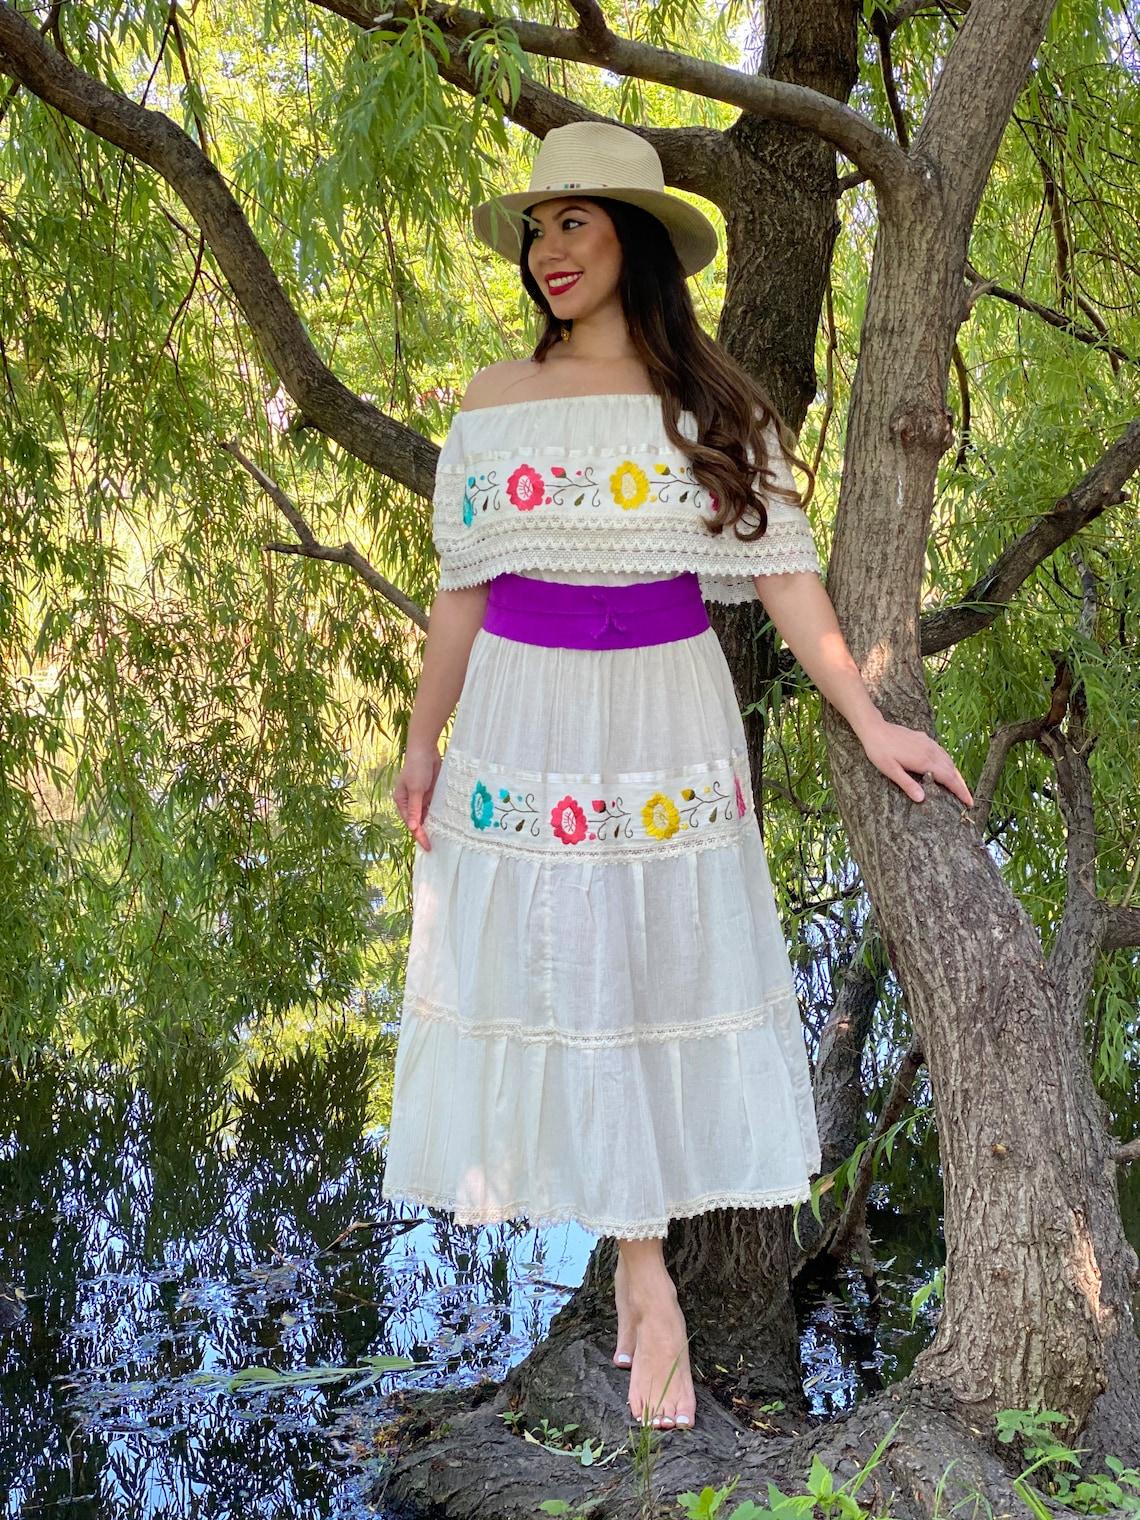 Lace Trim Off the Shoulder Dress. Floral Embroidered Dress.